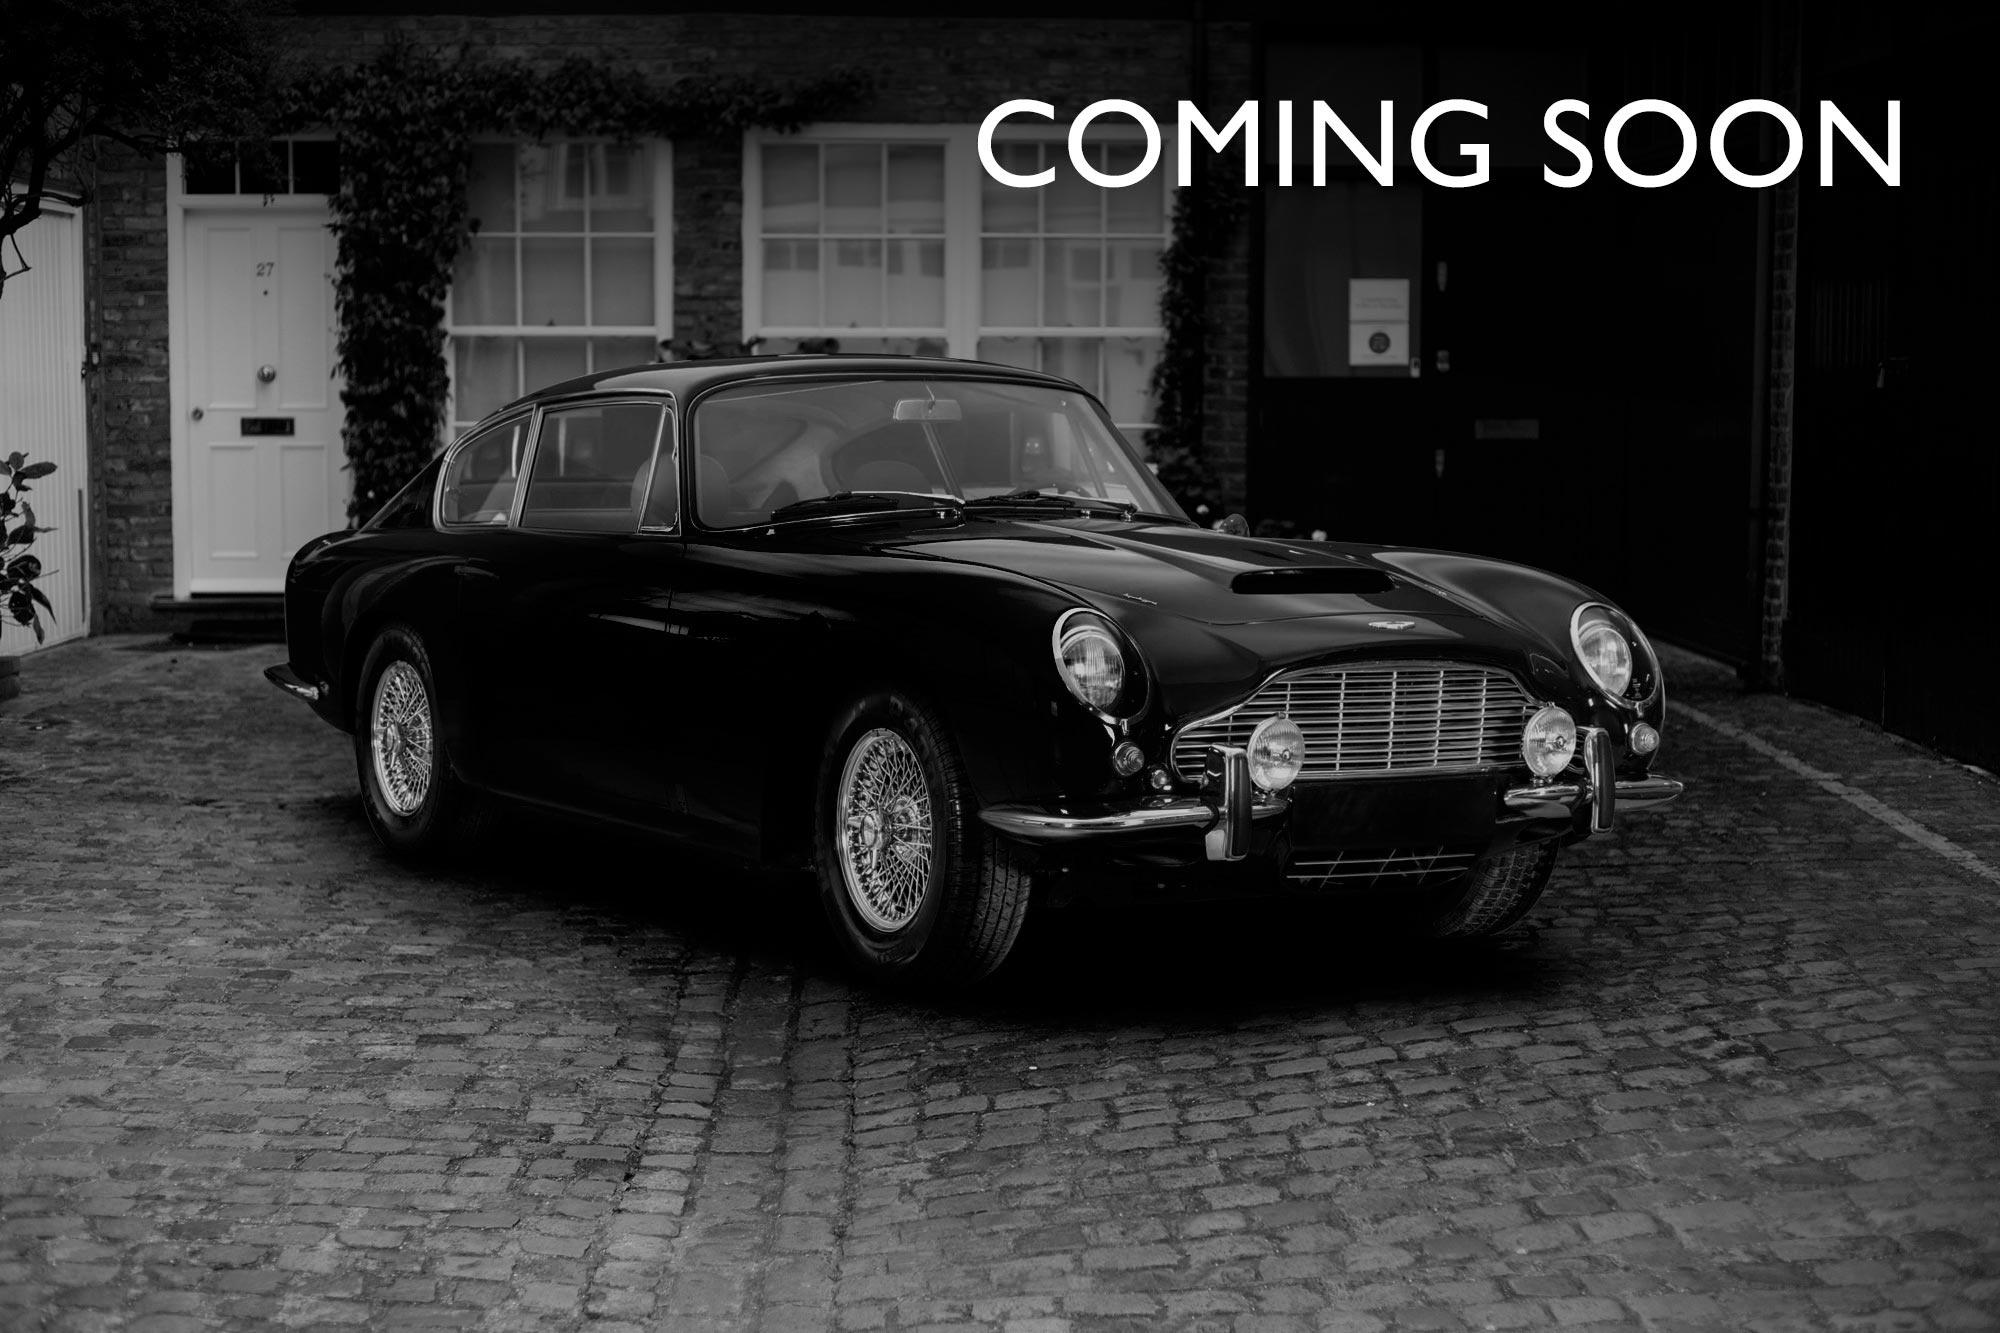 1966 Aston Martin Db6 Vintage Car For Sale